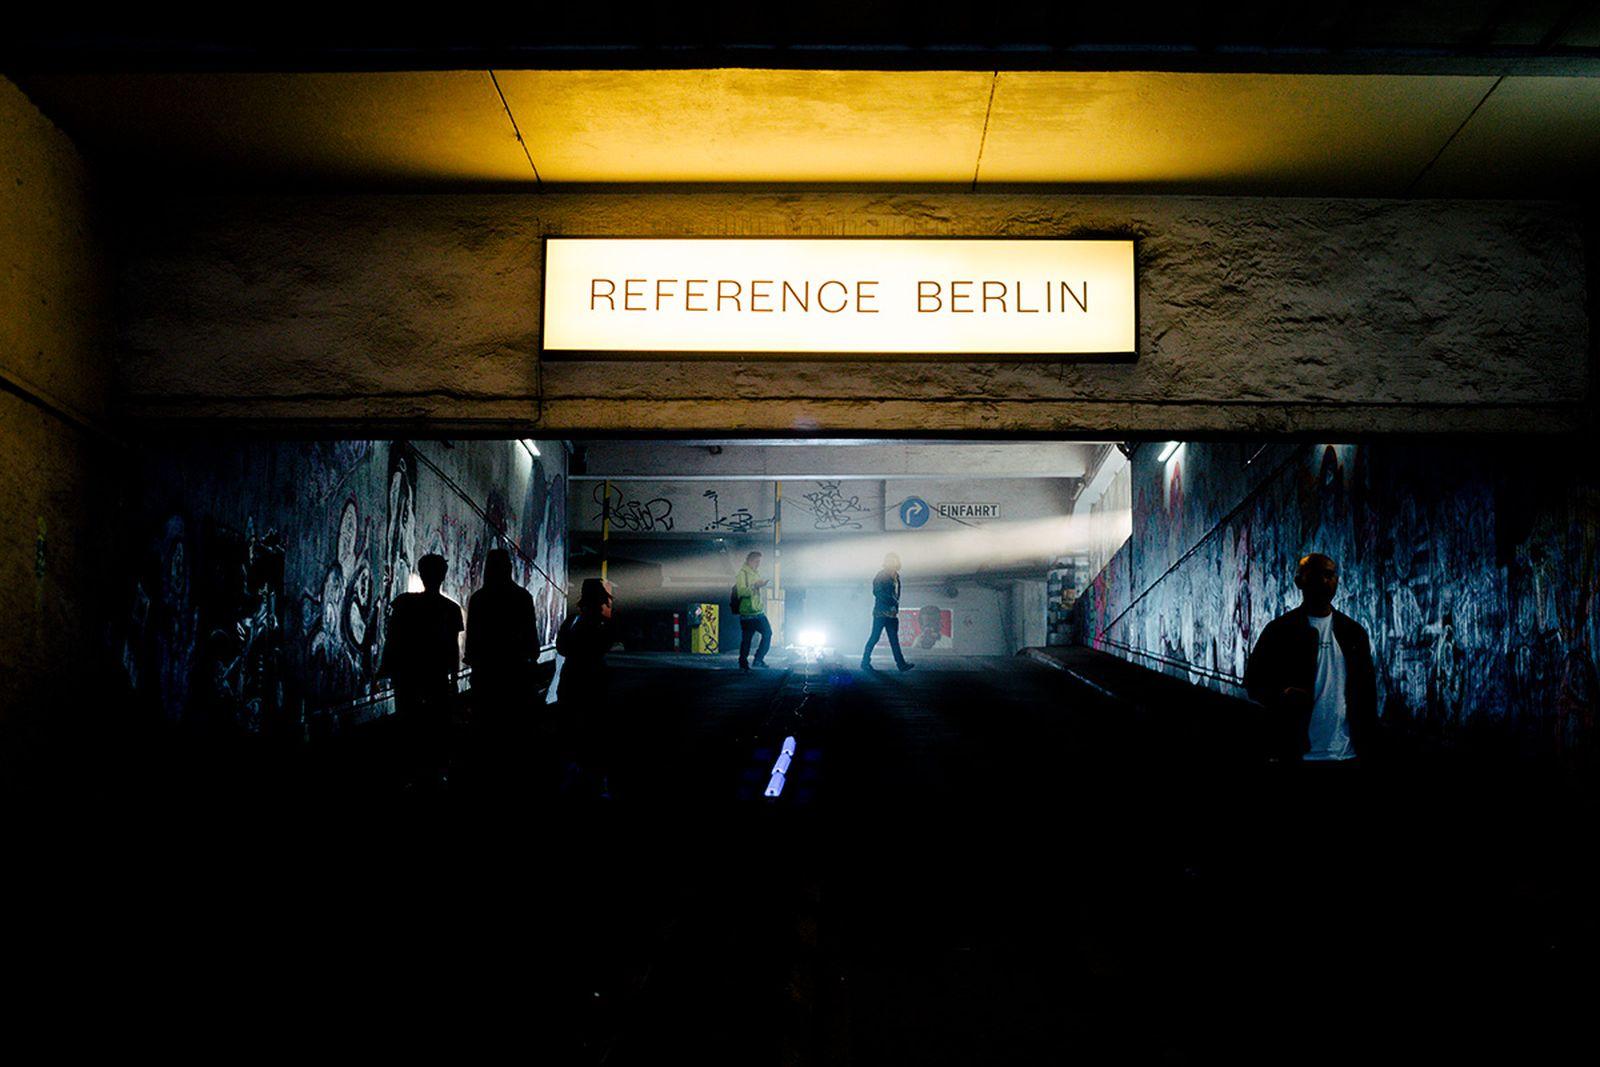 reference berlin highsnobiety Reference Studios